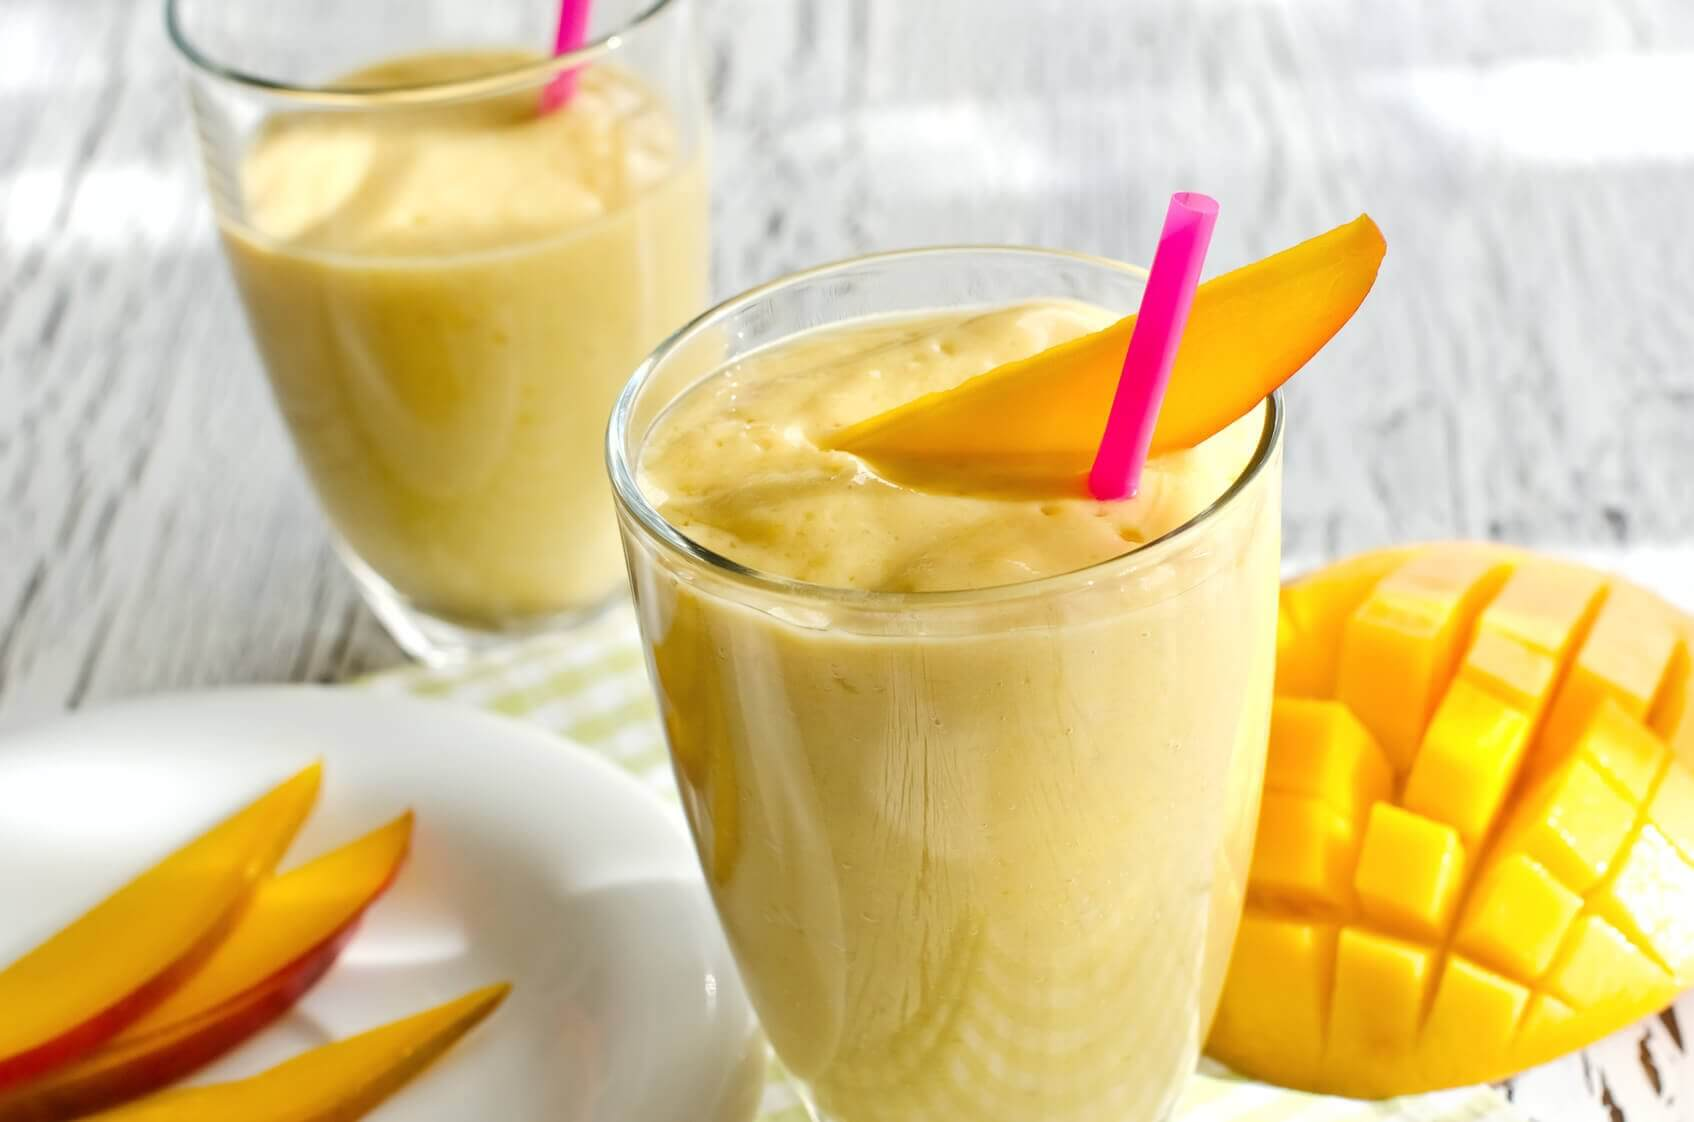 porkkanasmoothiet mangon kera